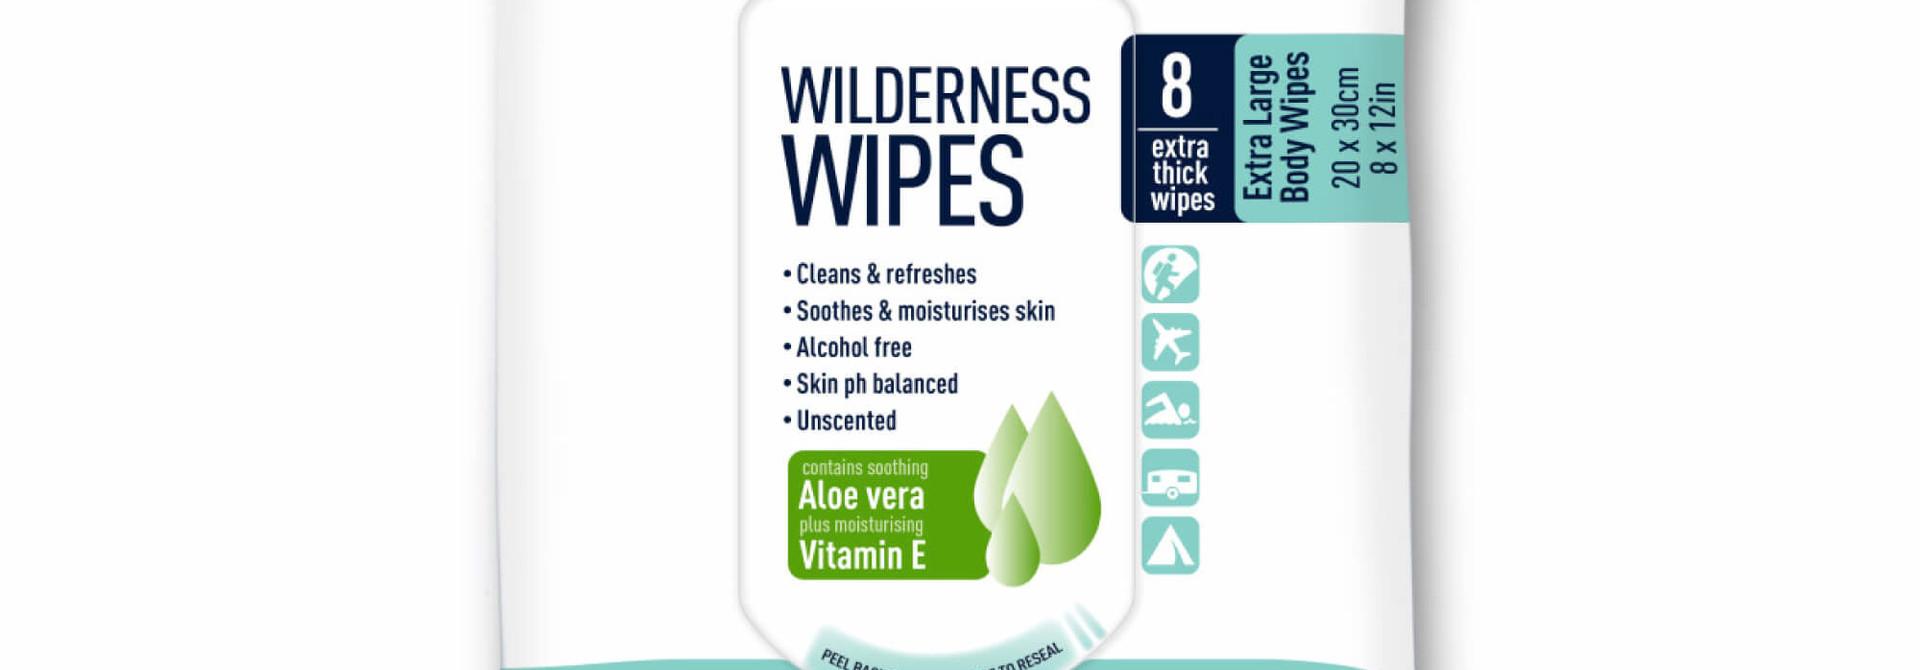 Wilderness Wipes